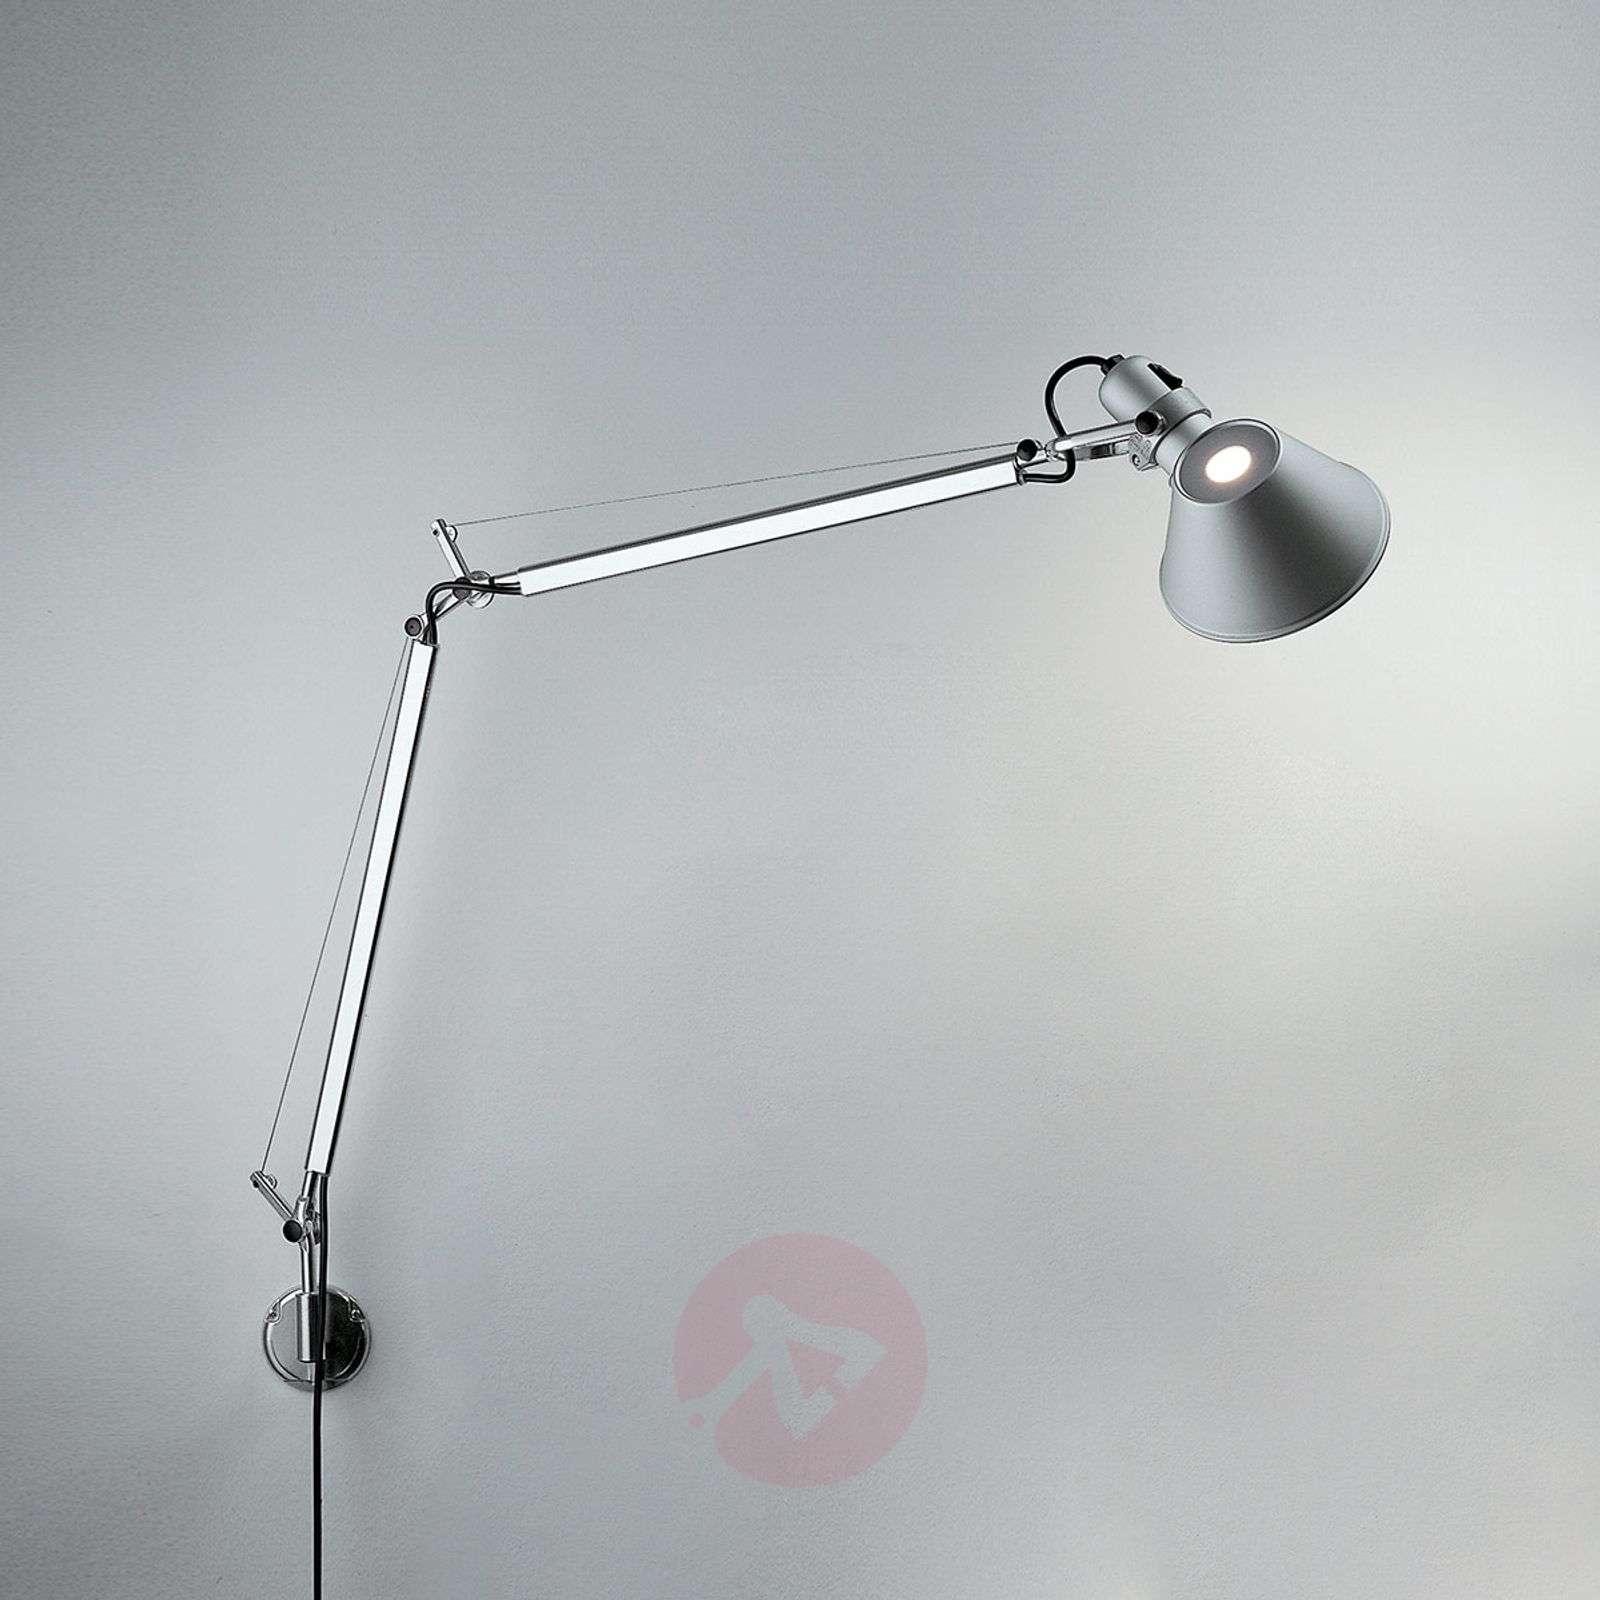 Artemide Tolomeo LED-seinävalaisin-1060266X-01